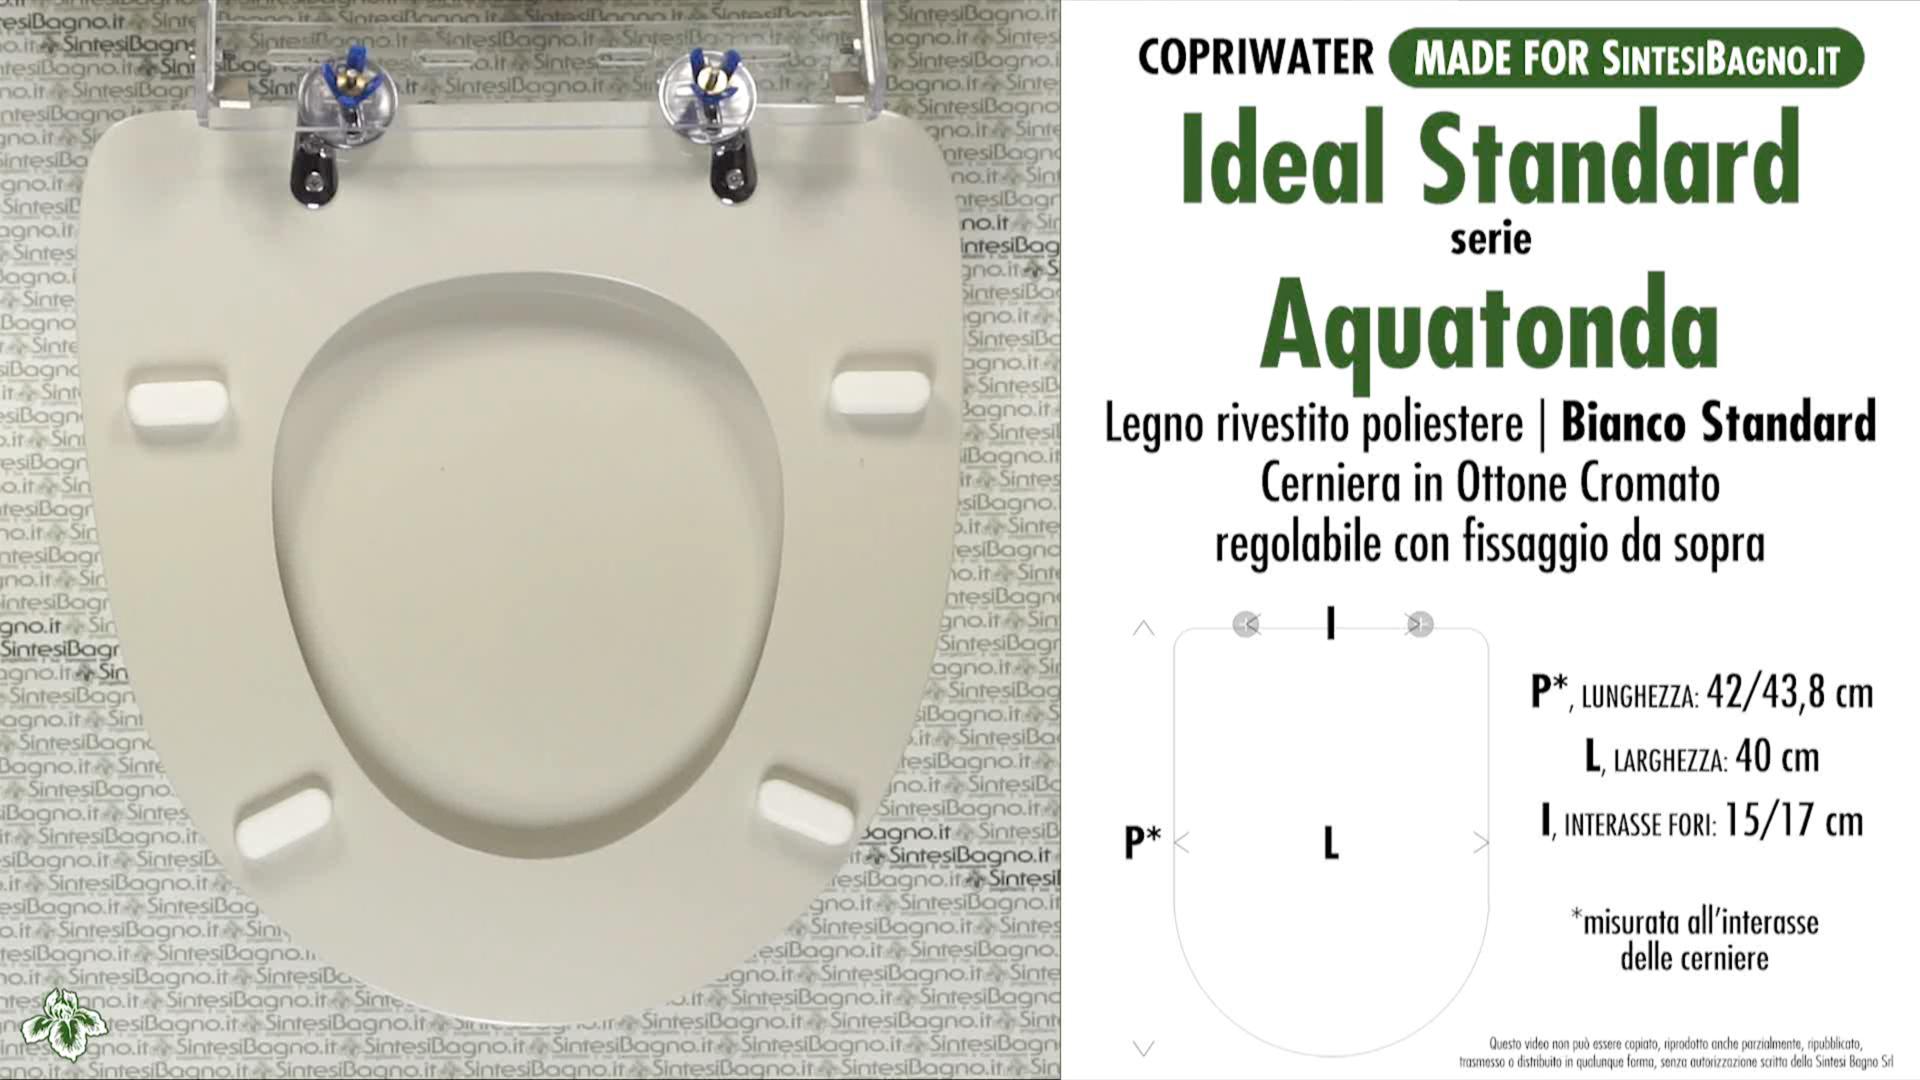 SCHEDA TECNICA MISURE copriwater IDEAL STANDARD AQUATONDA